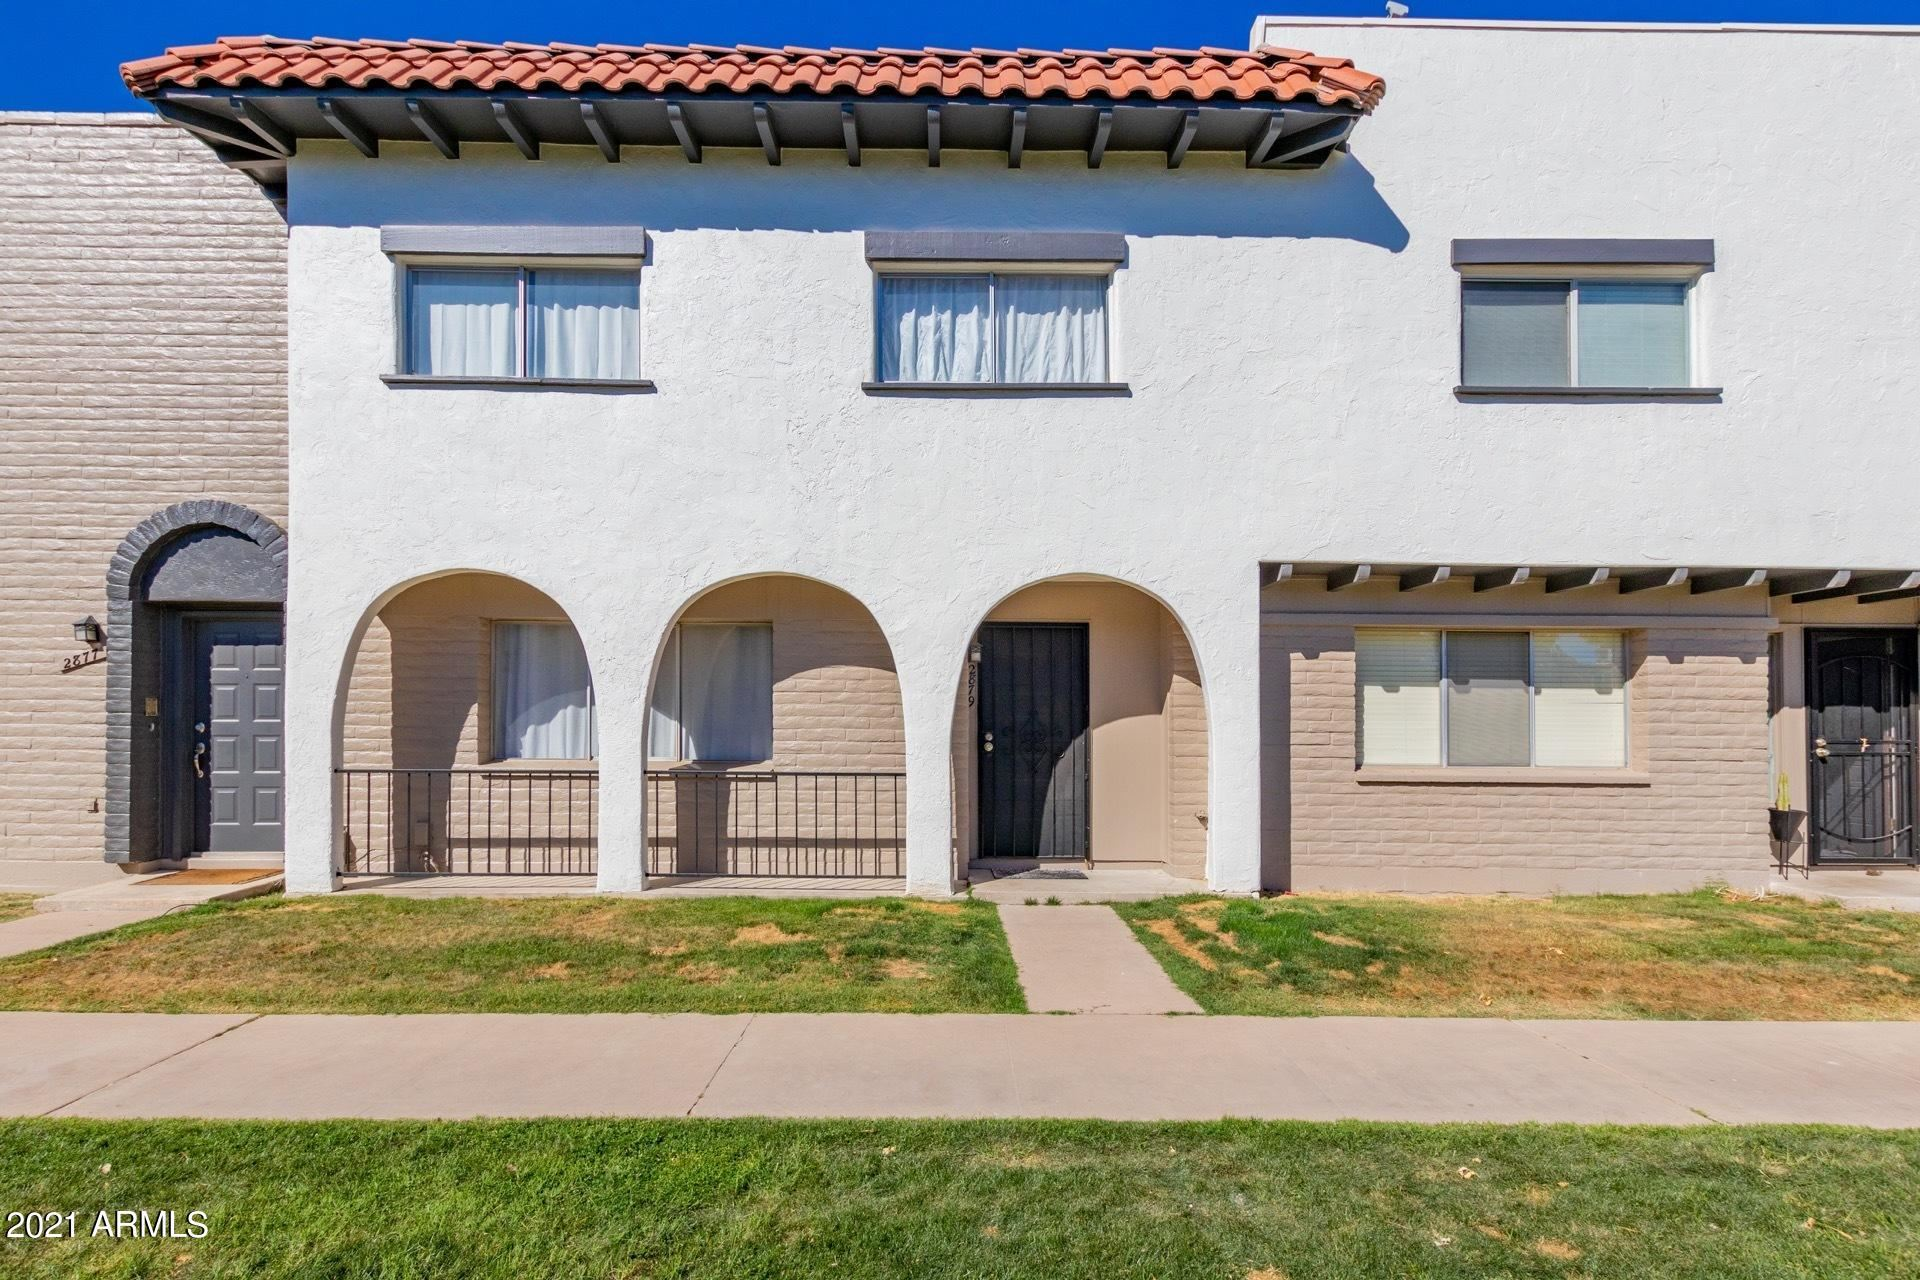 2879 E FAIRMOUNT Avenue, Phoenix, AZ 85016 - MLS#: 6190385